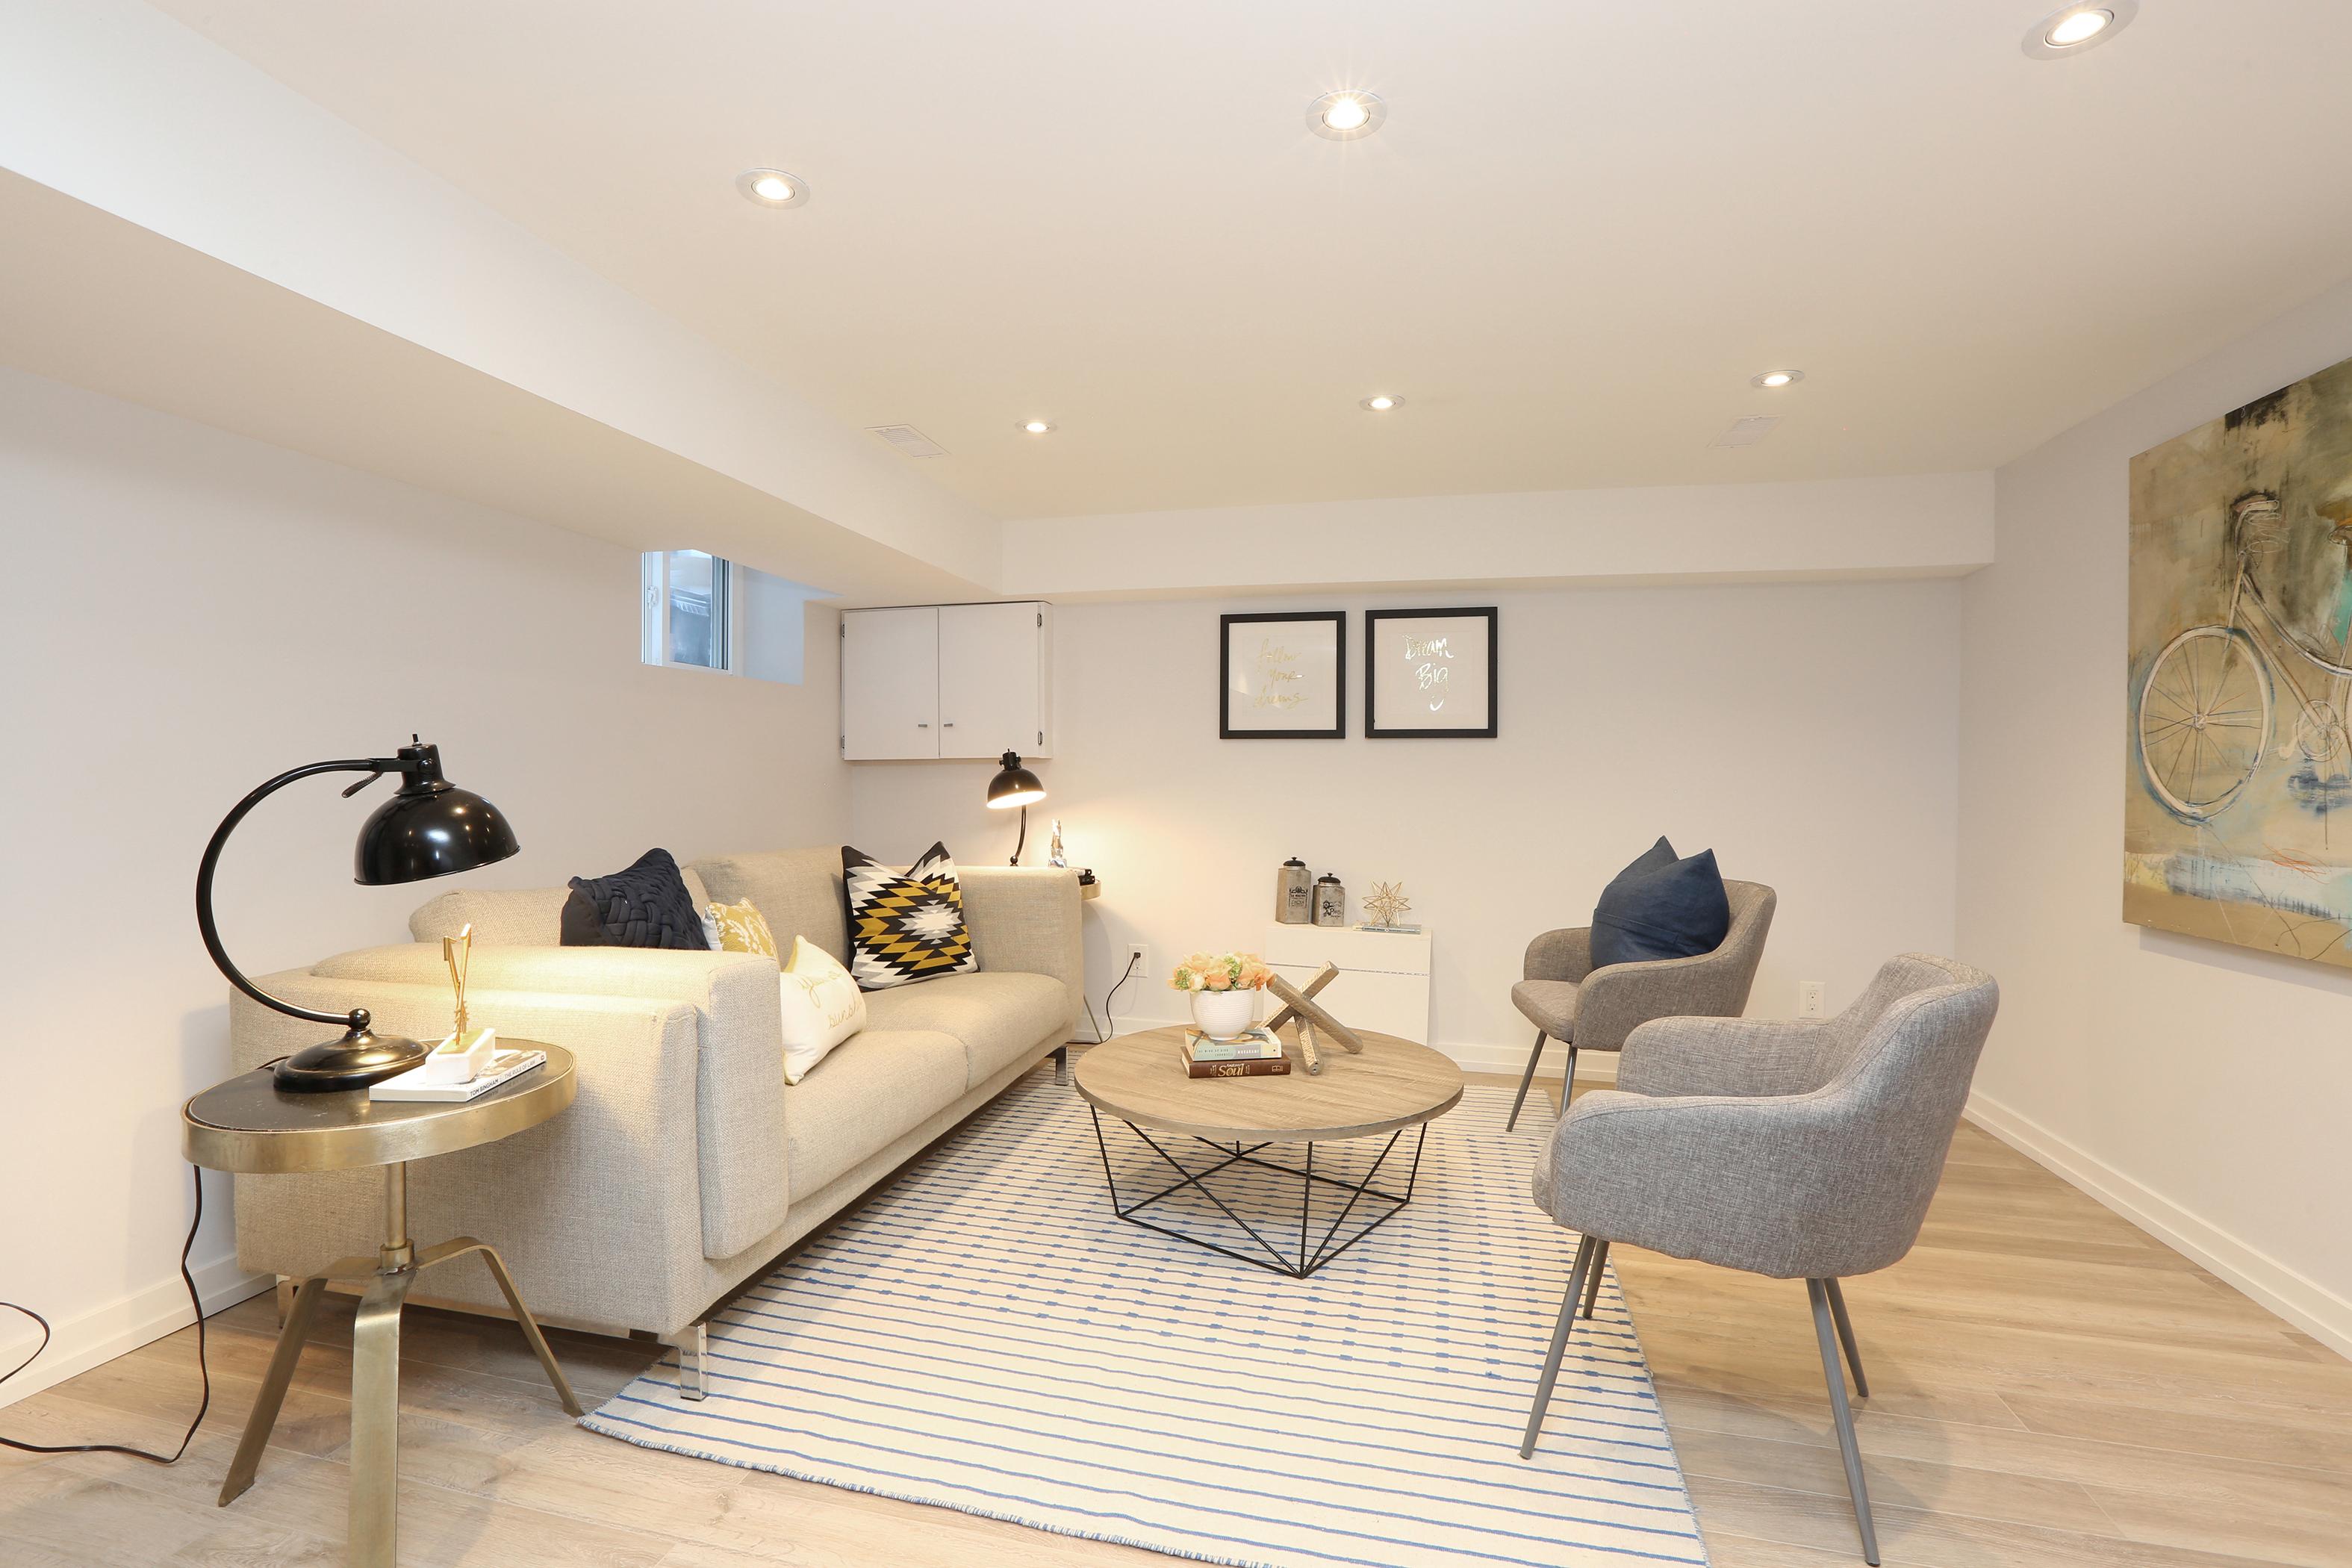 325 Milverton Blvd - Leslie Brlec   Etobicoke Real Estate Agent ...